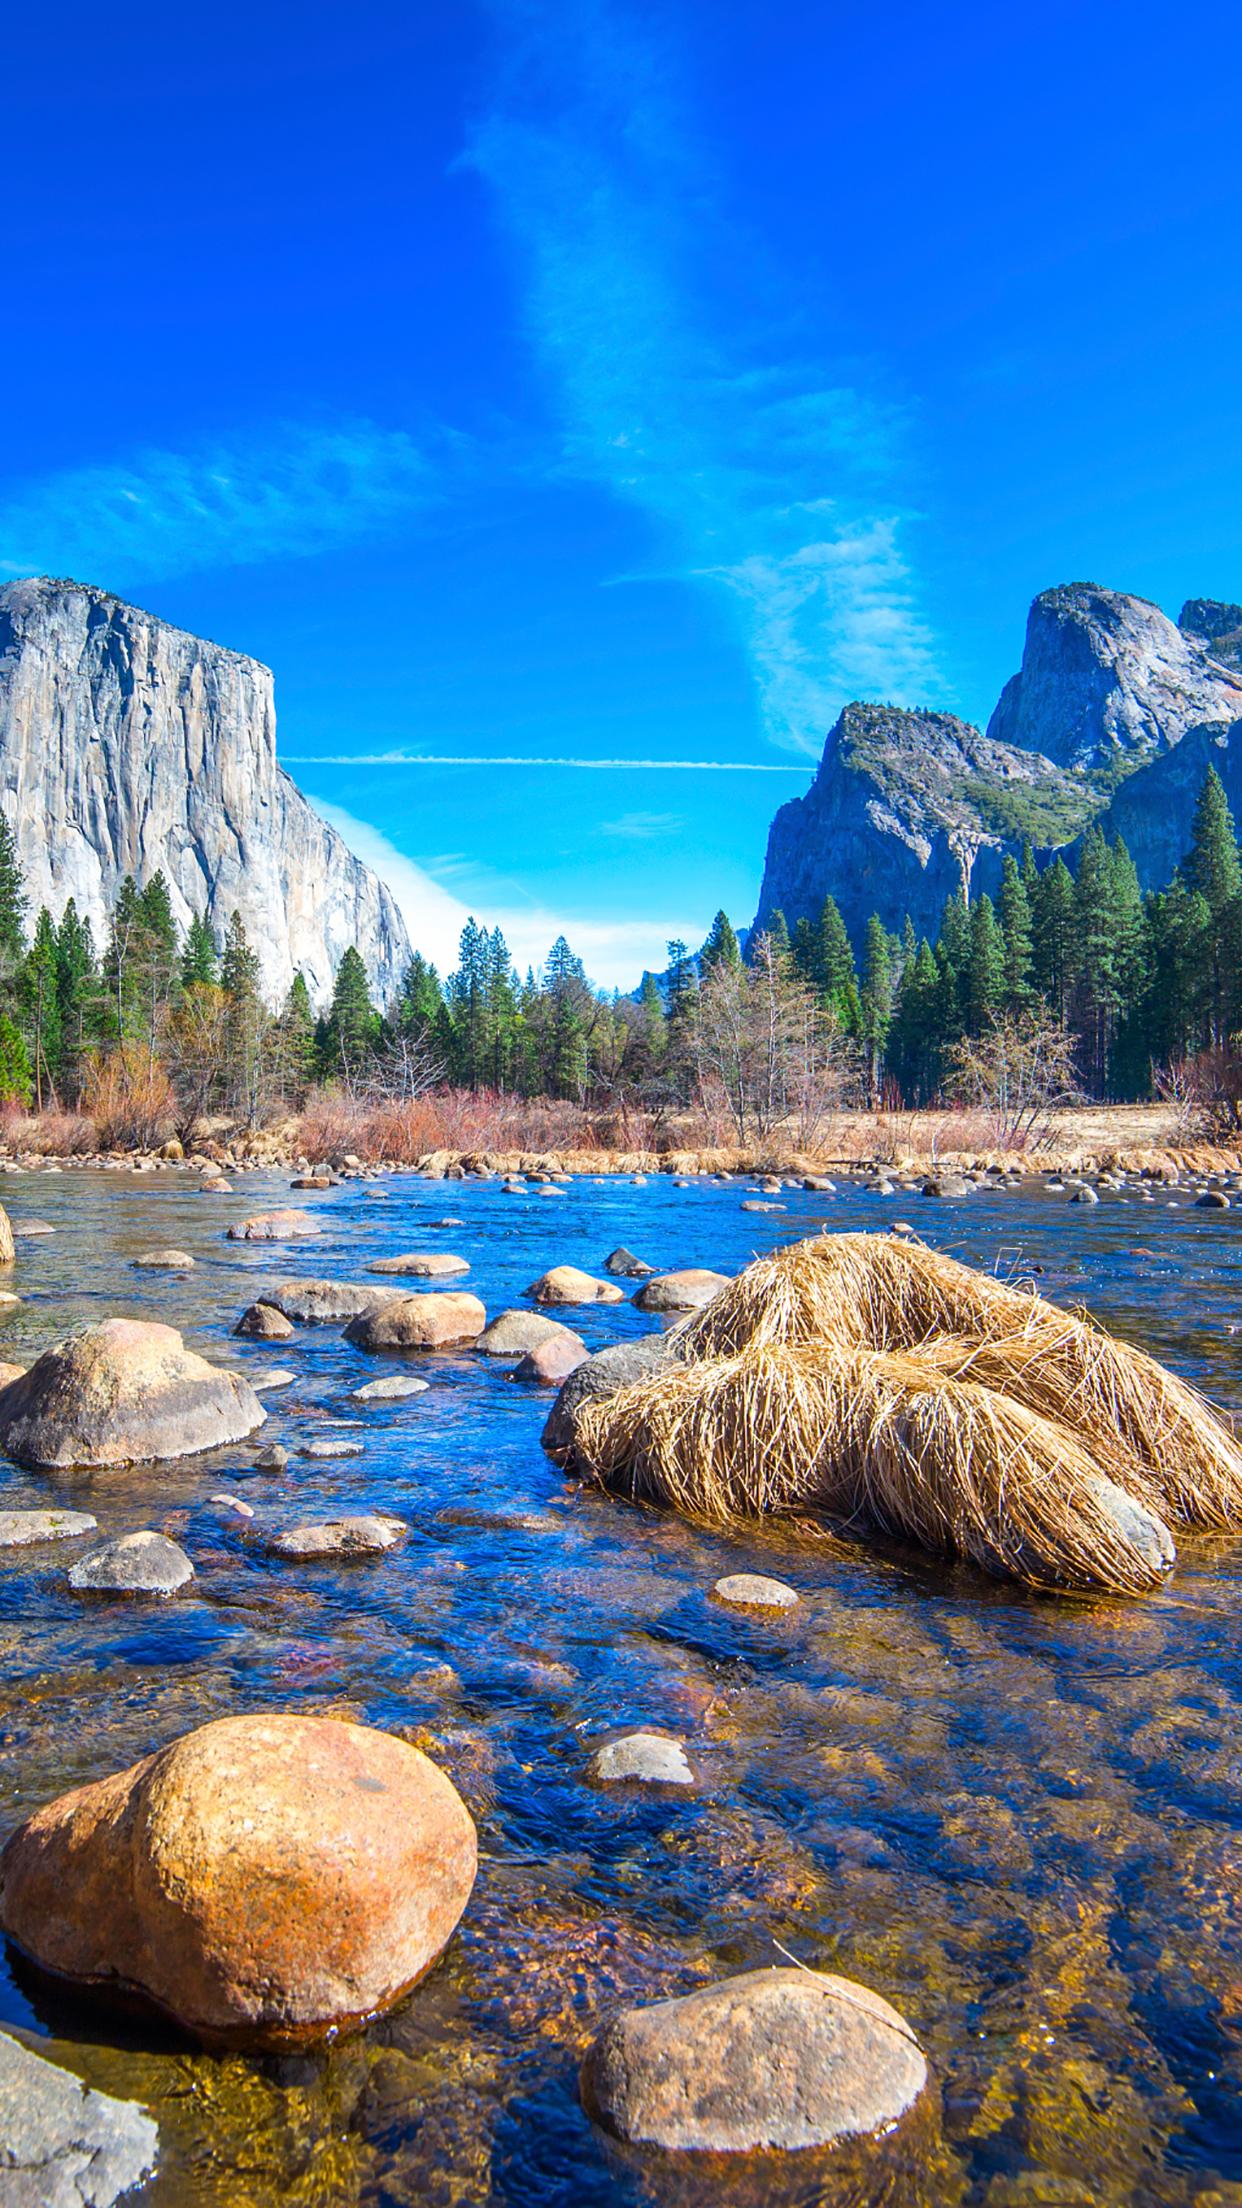 Yosemite Park 1 3Wallpapers iPhone Parallax Yosemite Park : 1